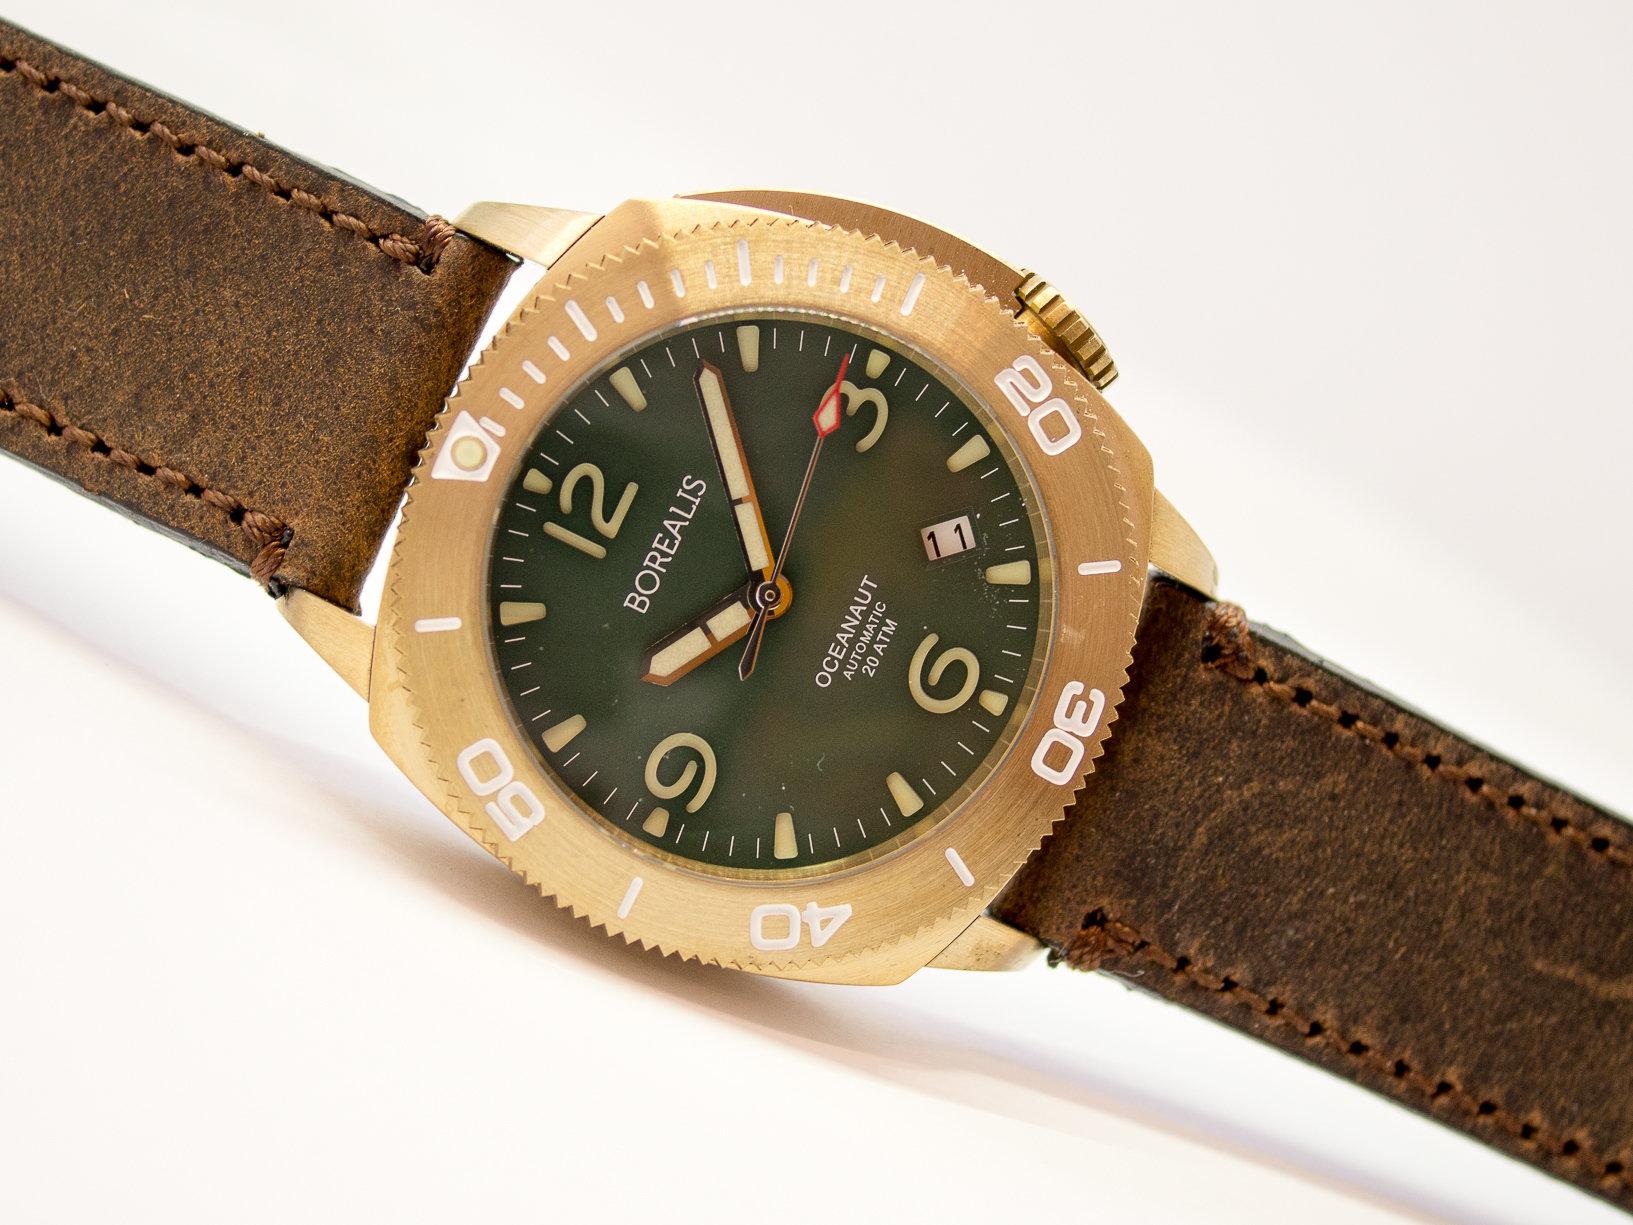 Borealis Oceanaut Aluminum Bronze Green Date 200m NH35 Automatic Diver Watch BOCEANAUTGREENDT